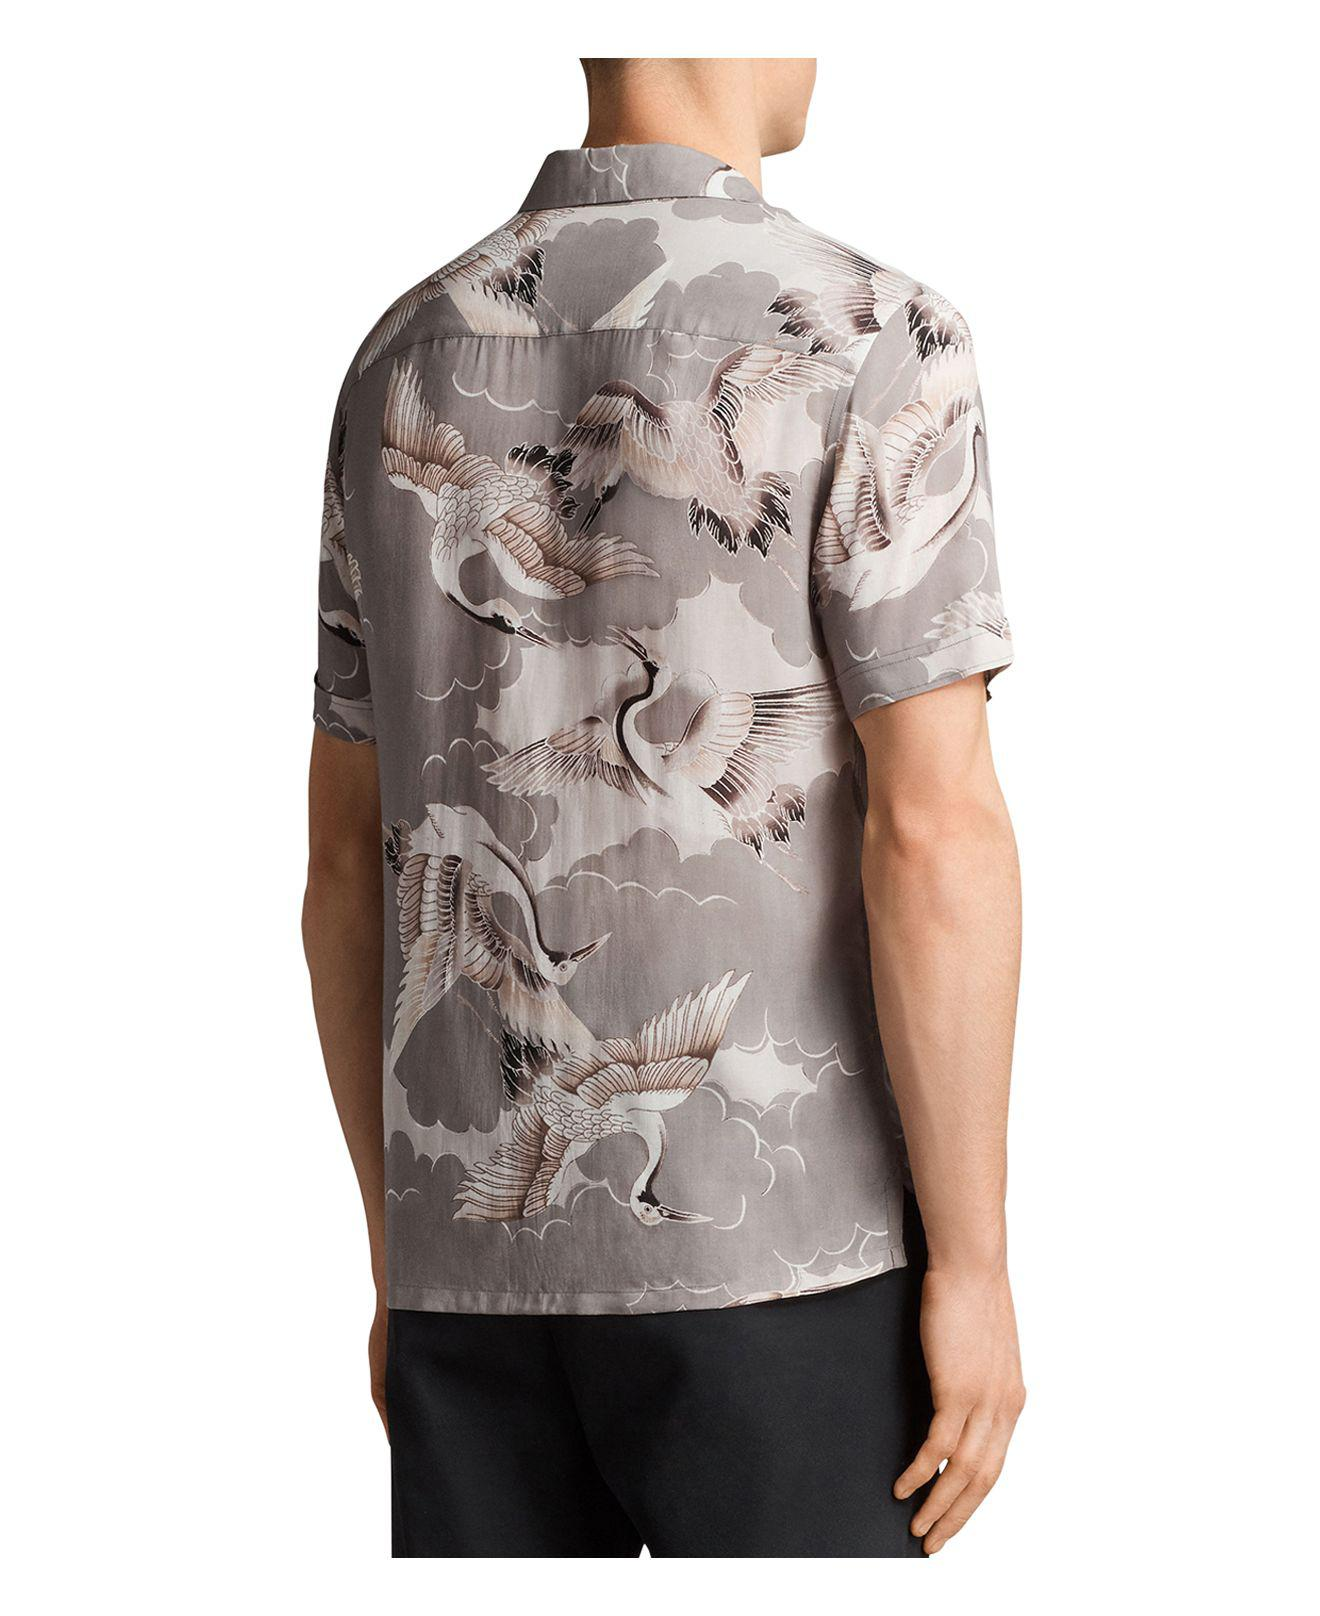 AllSaints Romaji Regular Fit Button-down Shirt in Light Gray (Grey) for Men